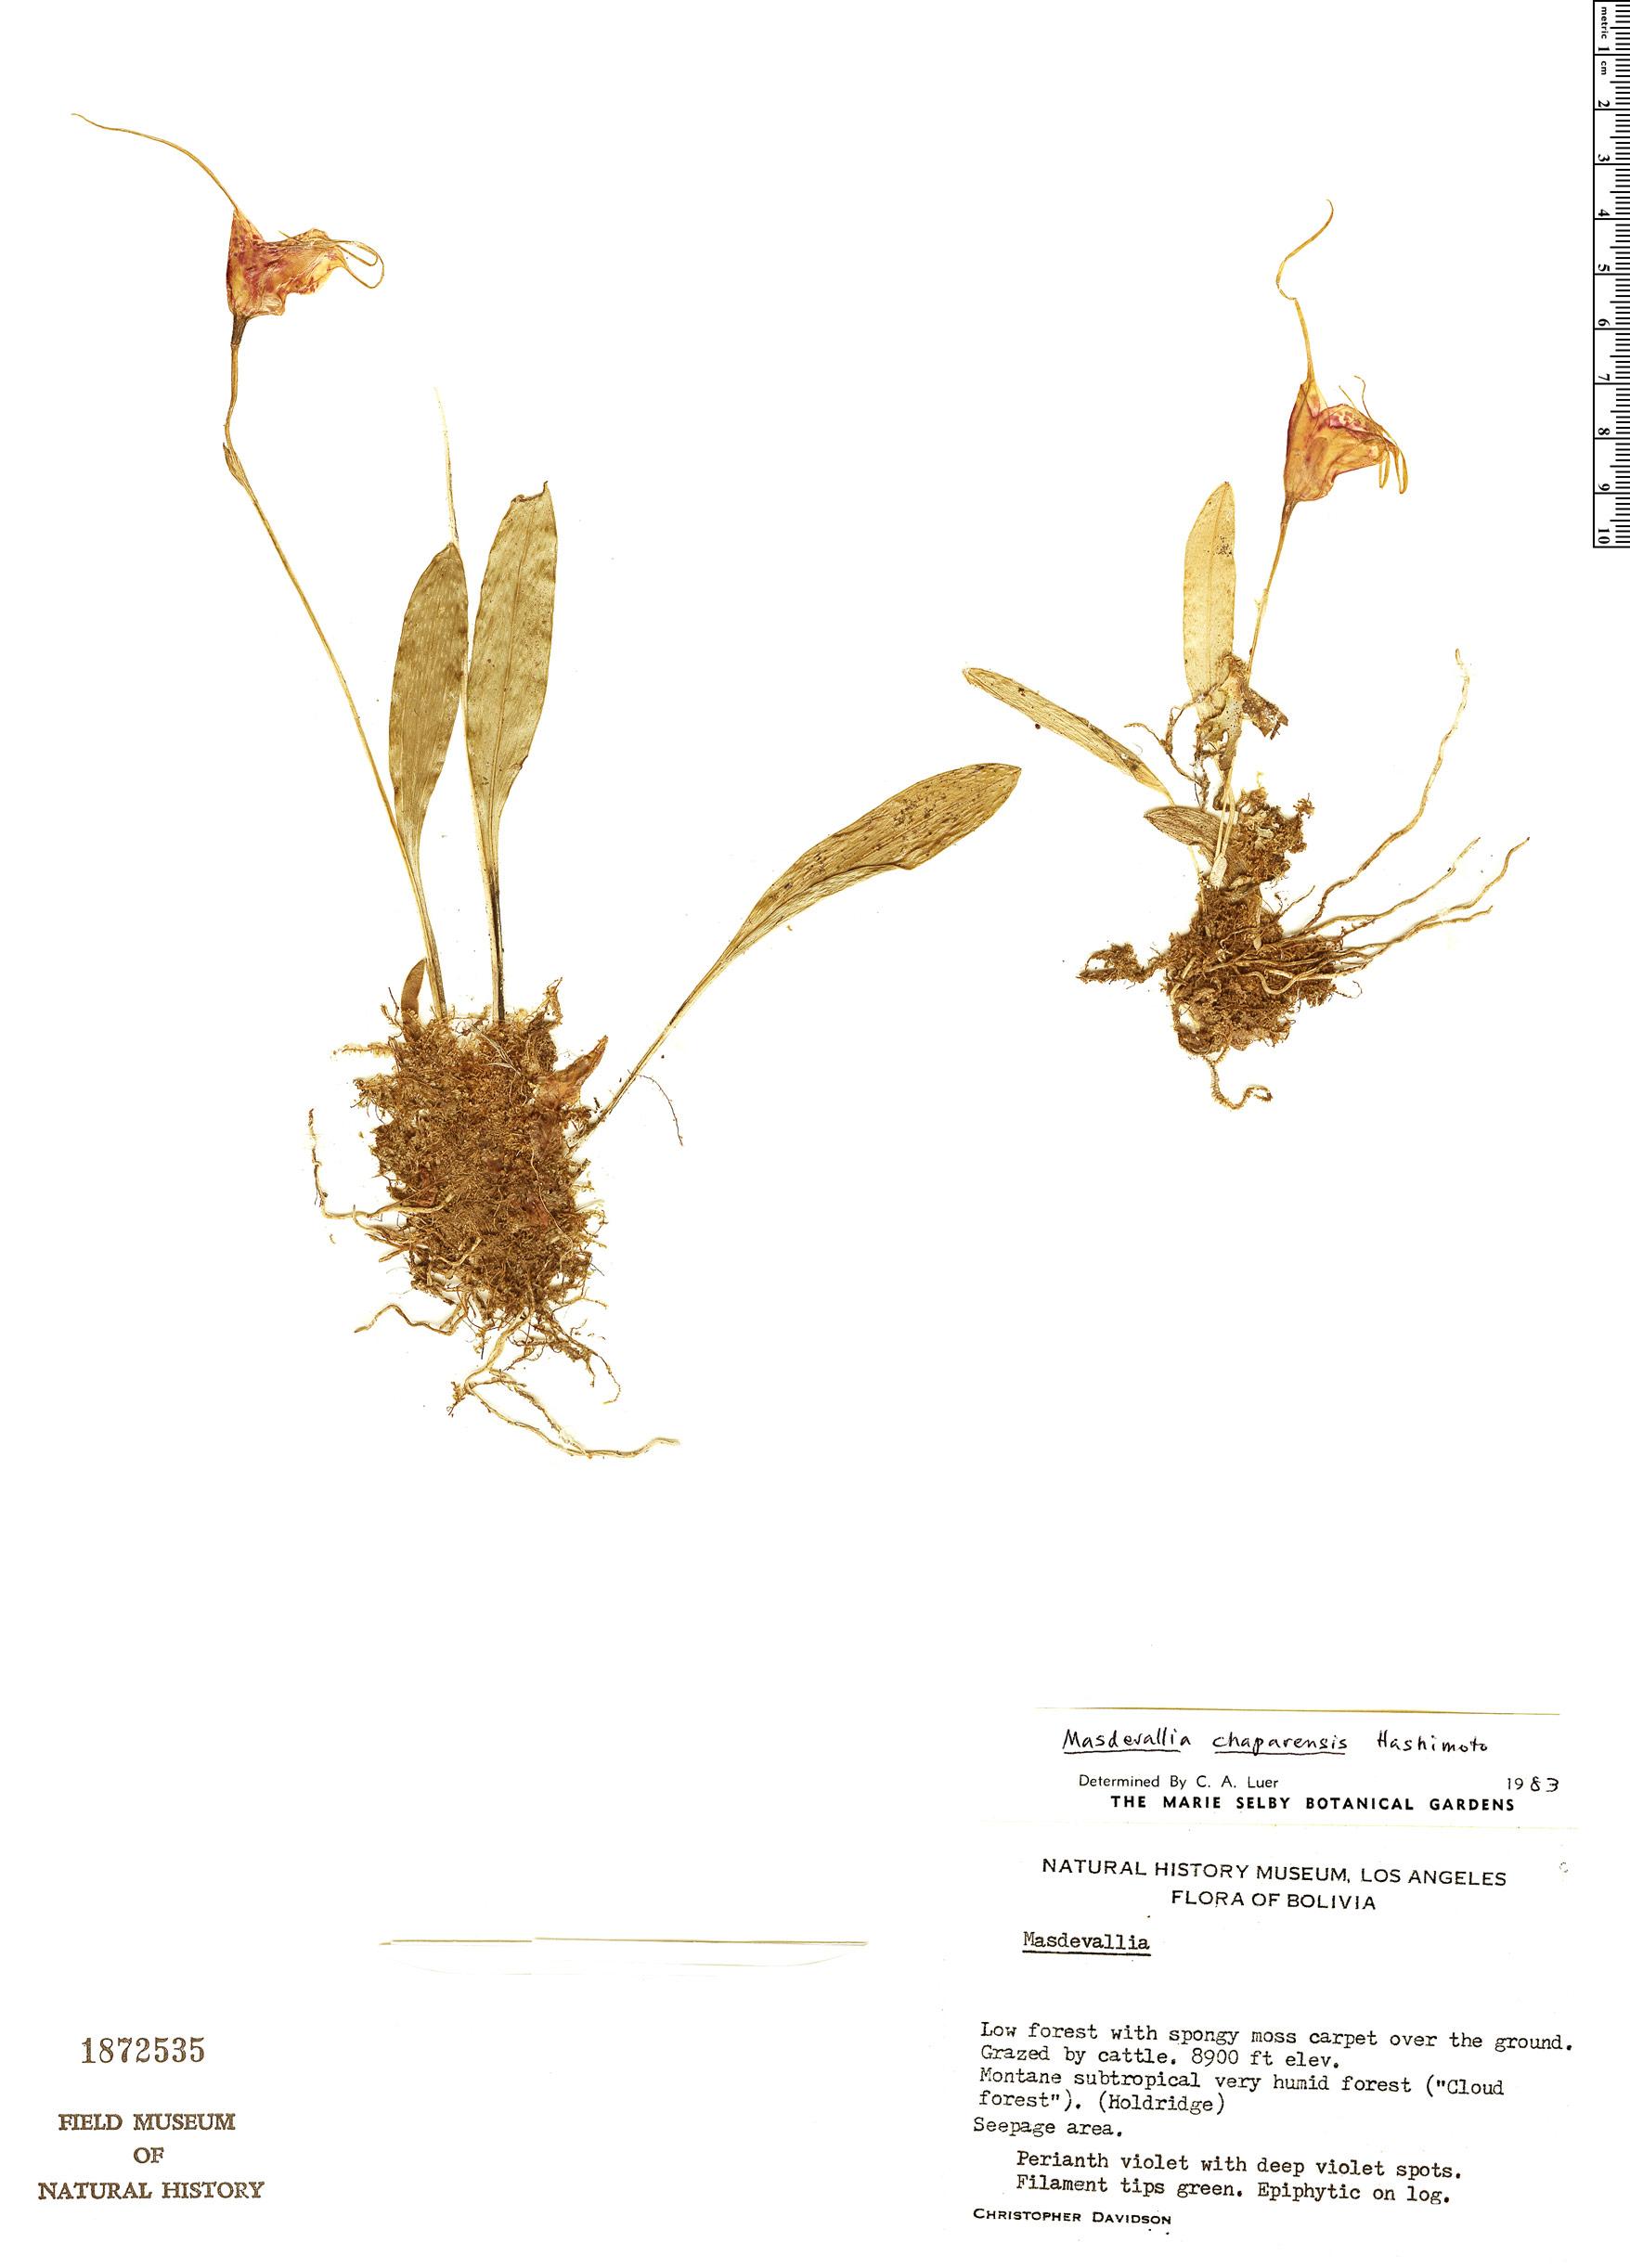 Specimen: Masdevallia chaparensis